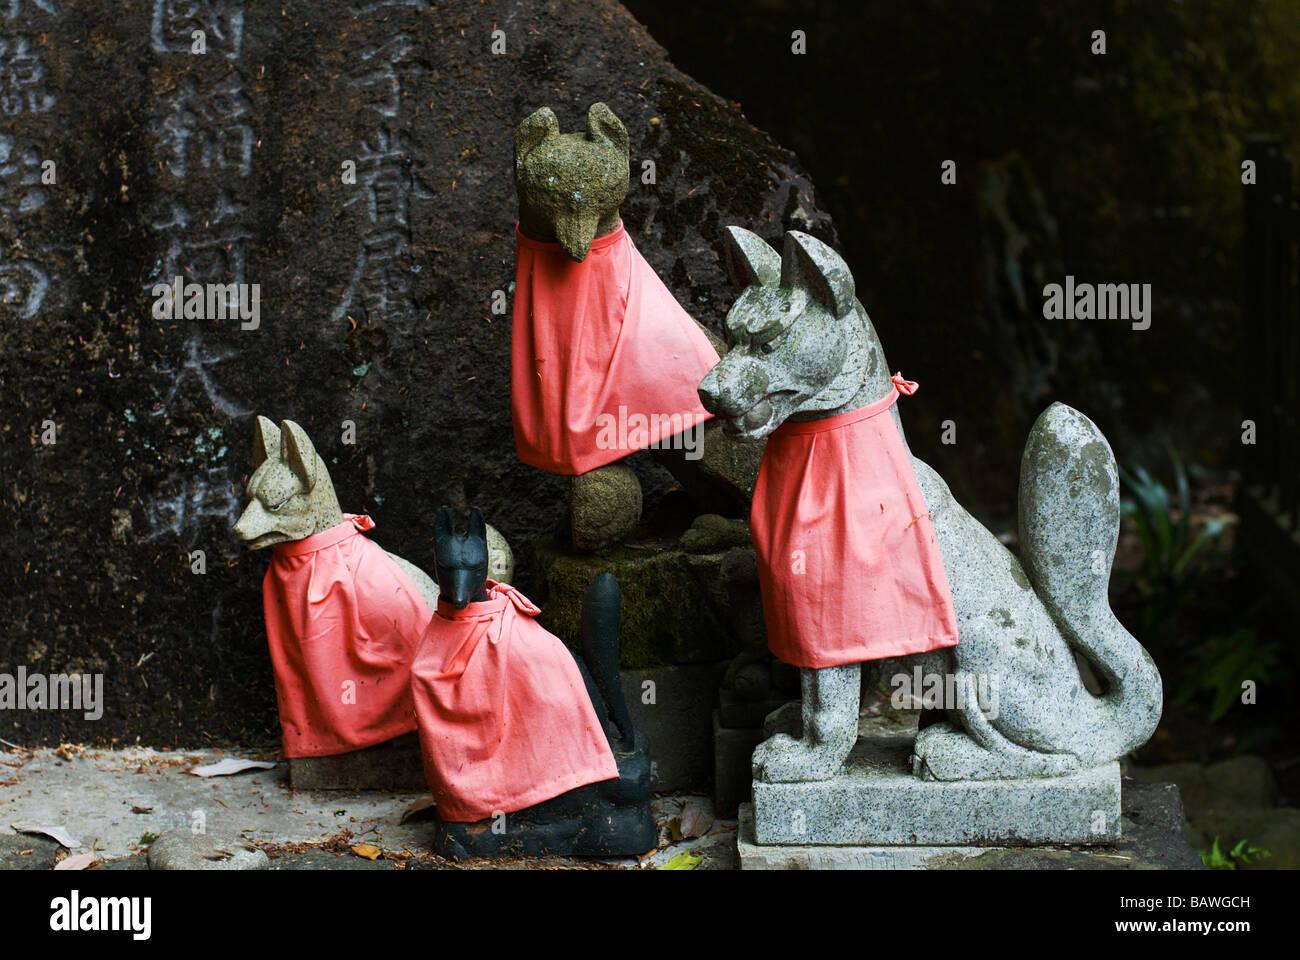 Baby inari fox for sale - Inari Fox Statues In Red Bibs At The Small Shinto Inari Shrine On Mount Takao